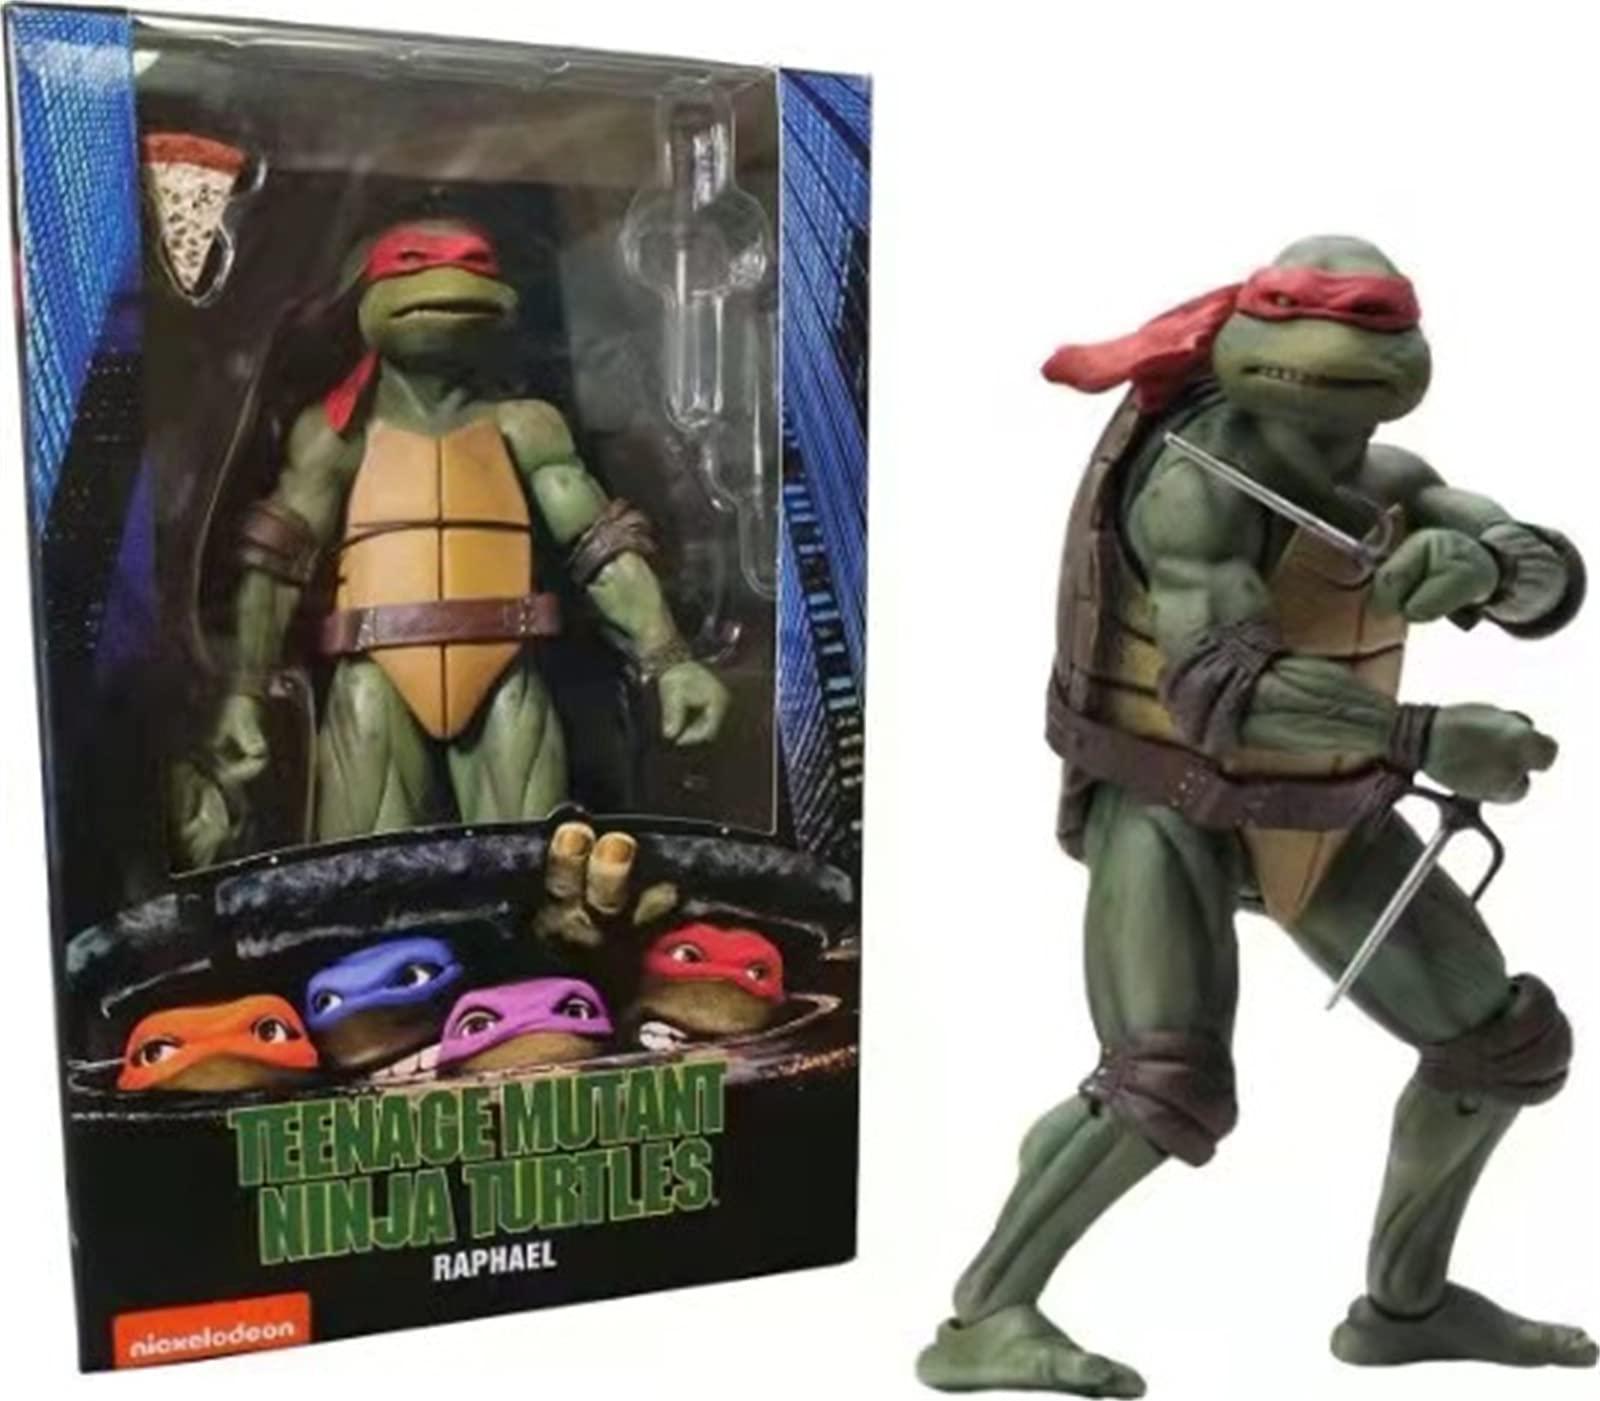 Toyskys-Teenage Mutant Ninja Turtles--90's Movie Raphael 6-inch Action Figure-2019 GameStop Exclusive (4 Colors)